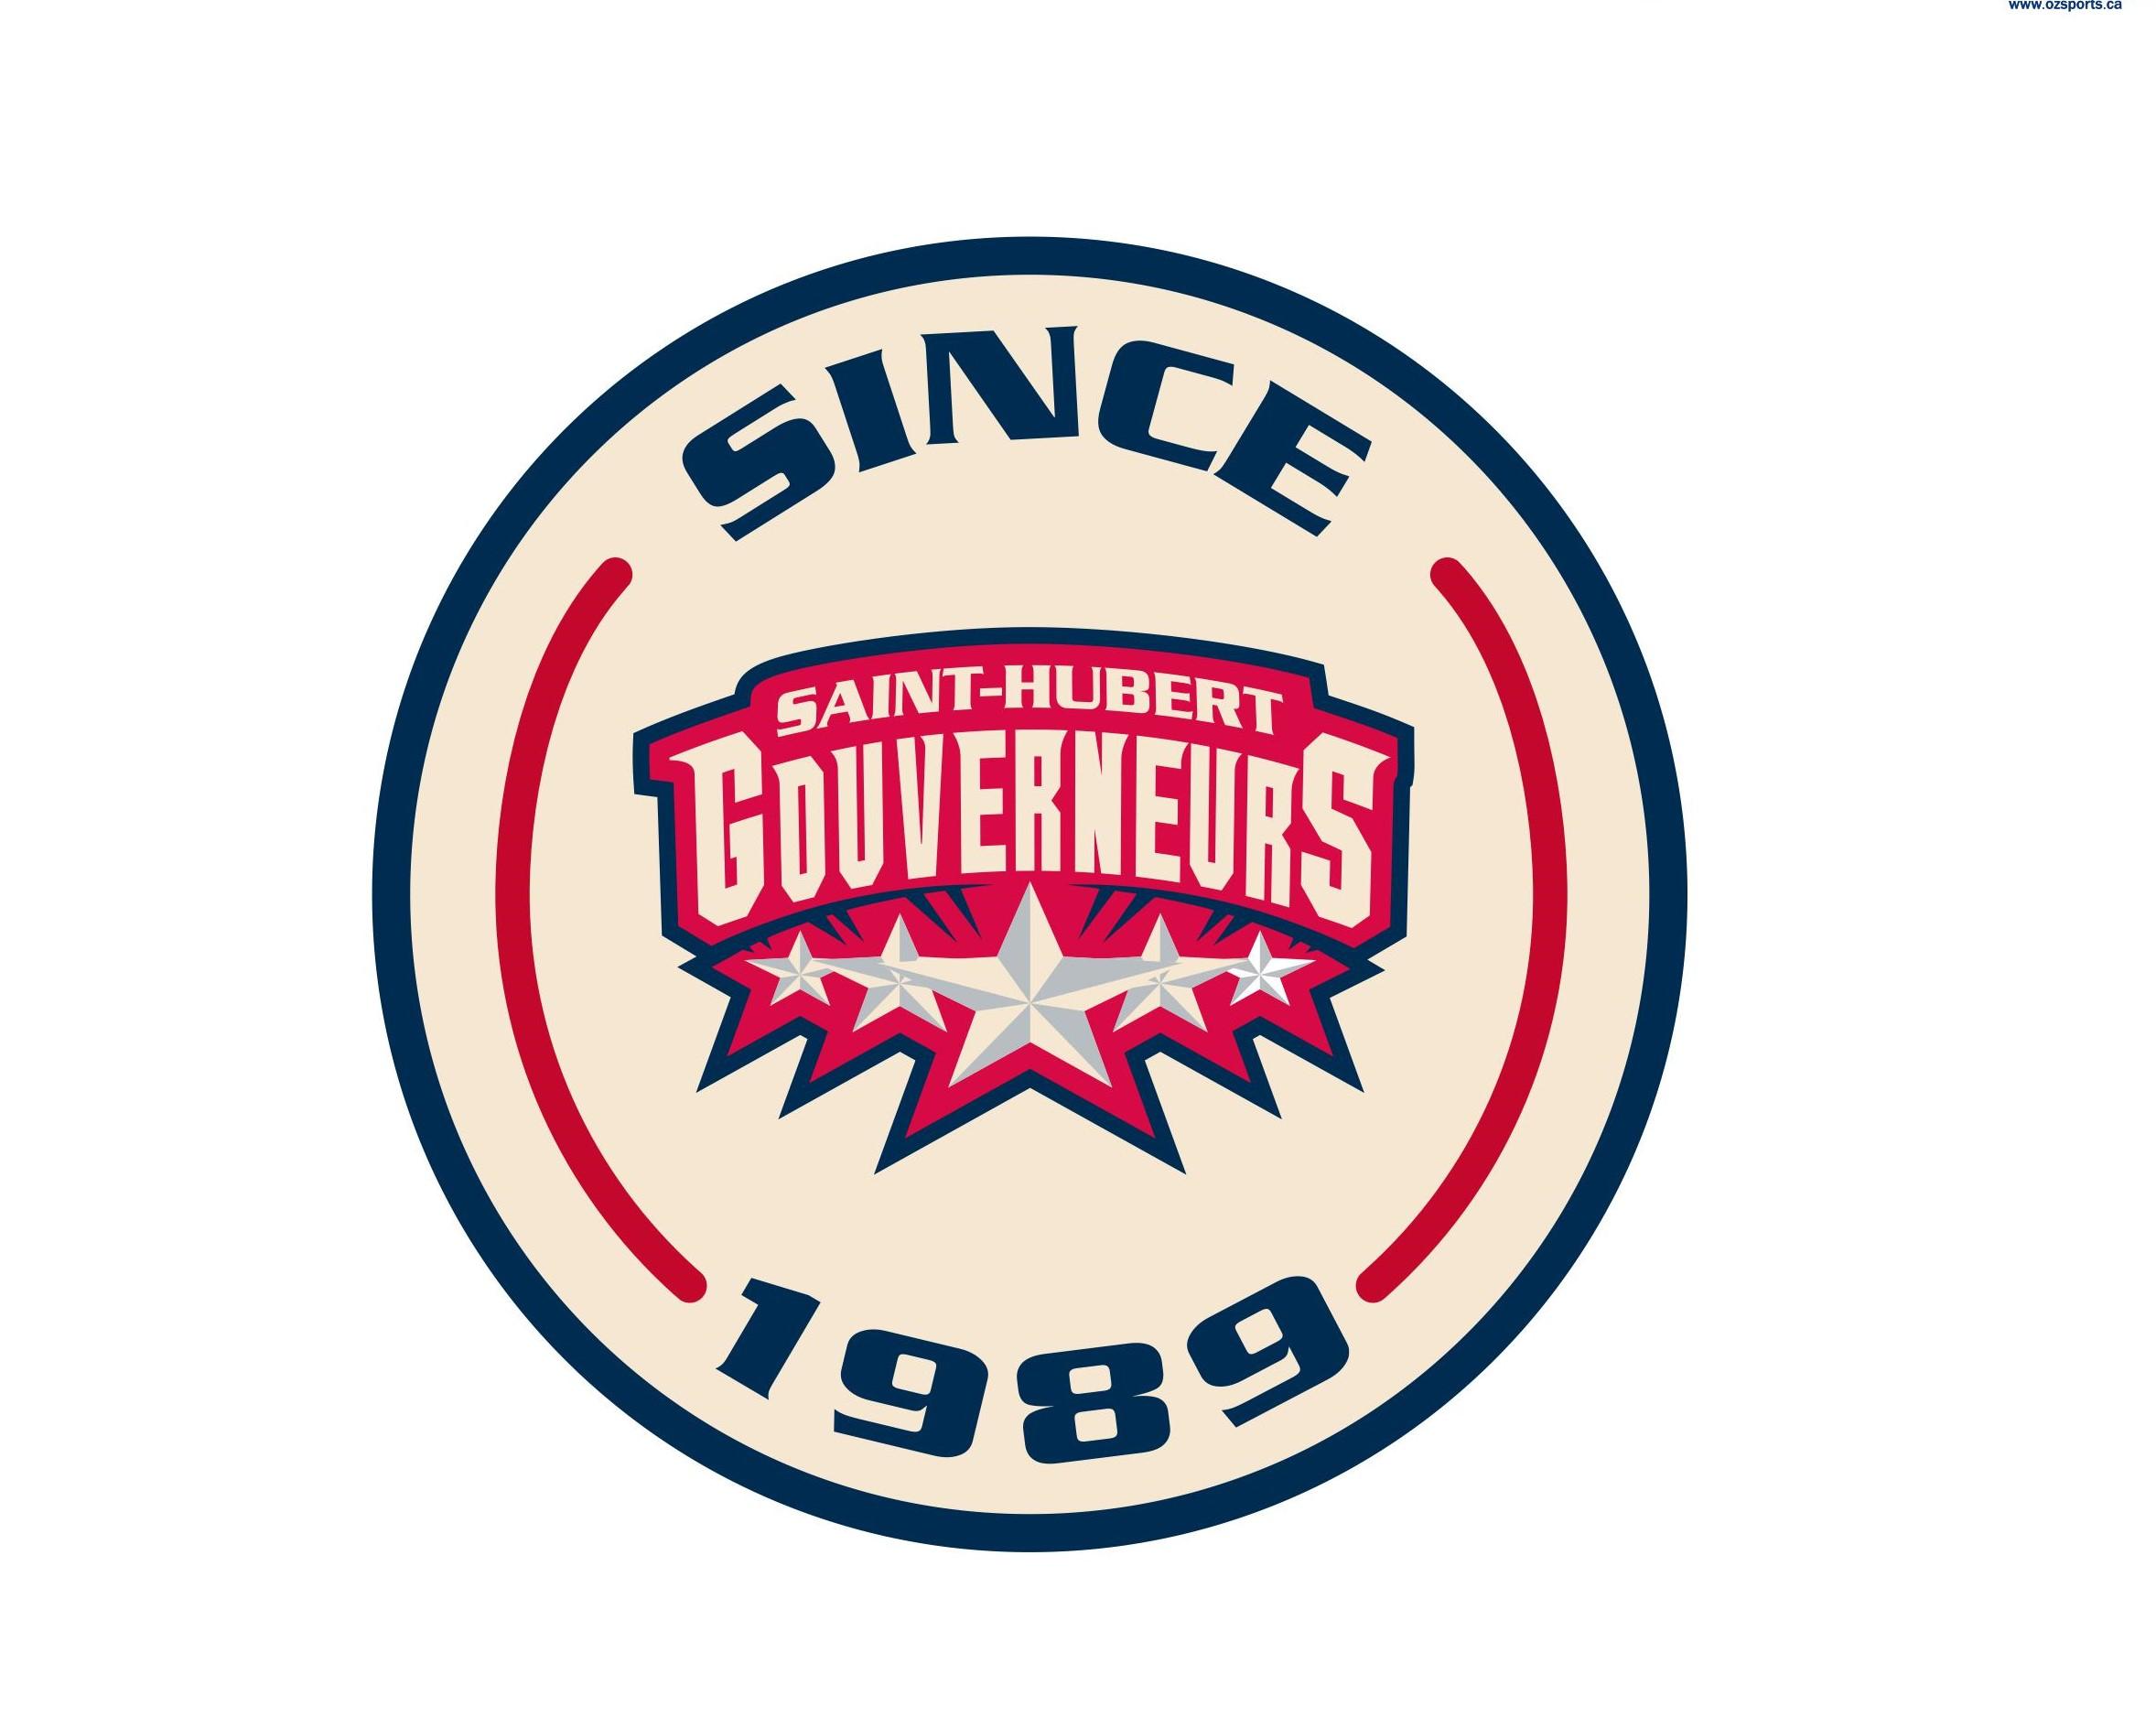 logo since 1989 jpeg.jpg (333 KB)